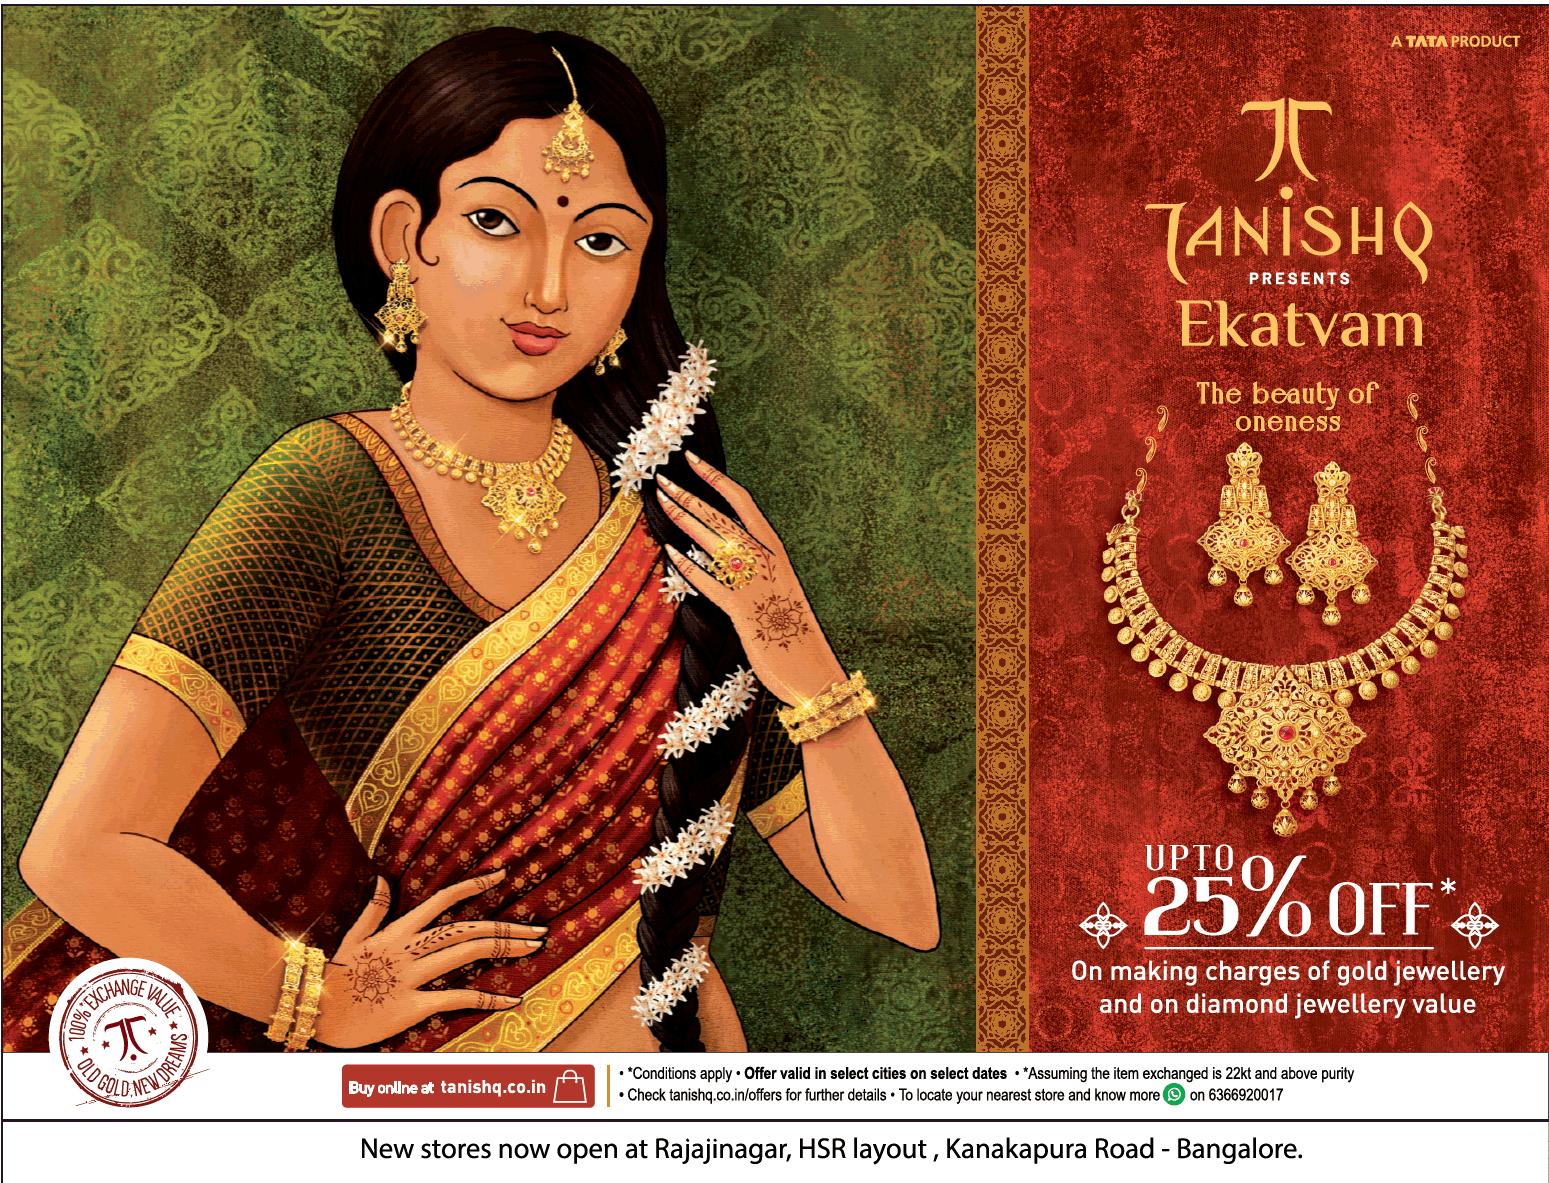 tanish-ekatvam-upto-25%-off-on-making-charges-of-gold-jewellery-ad-bangalore-times-16-10-2020